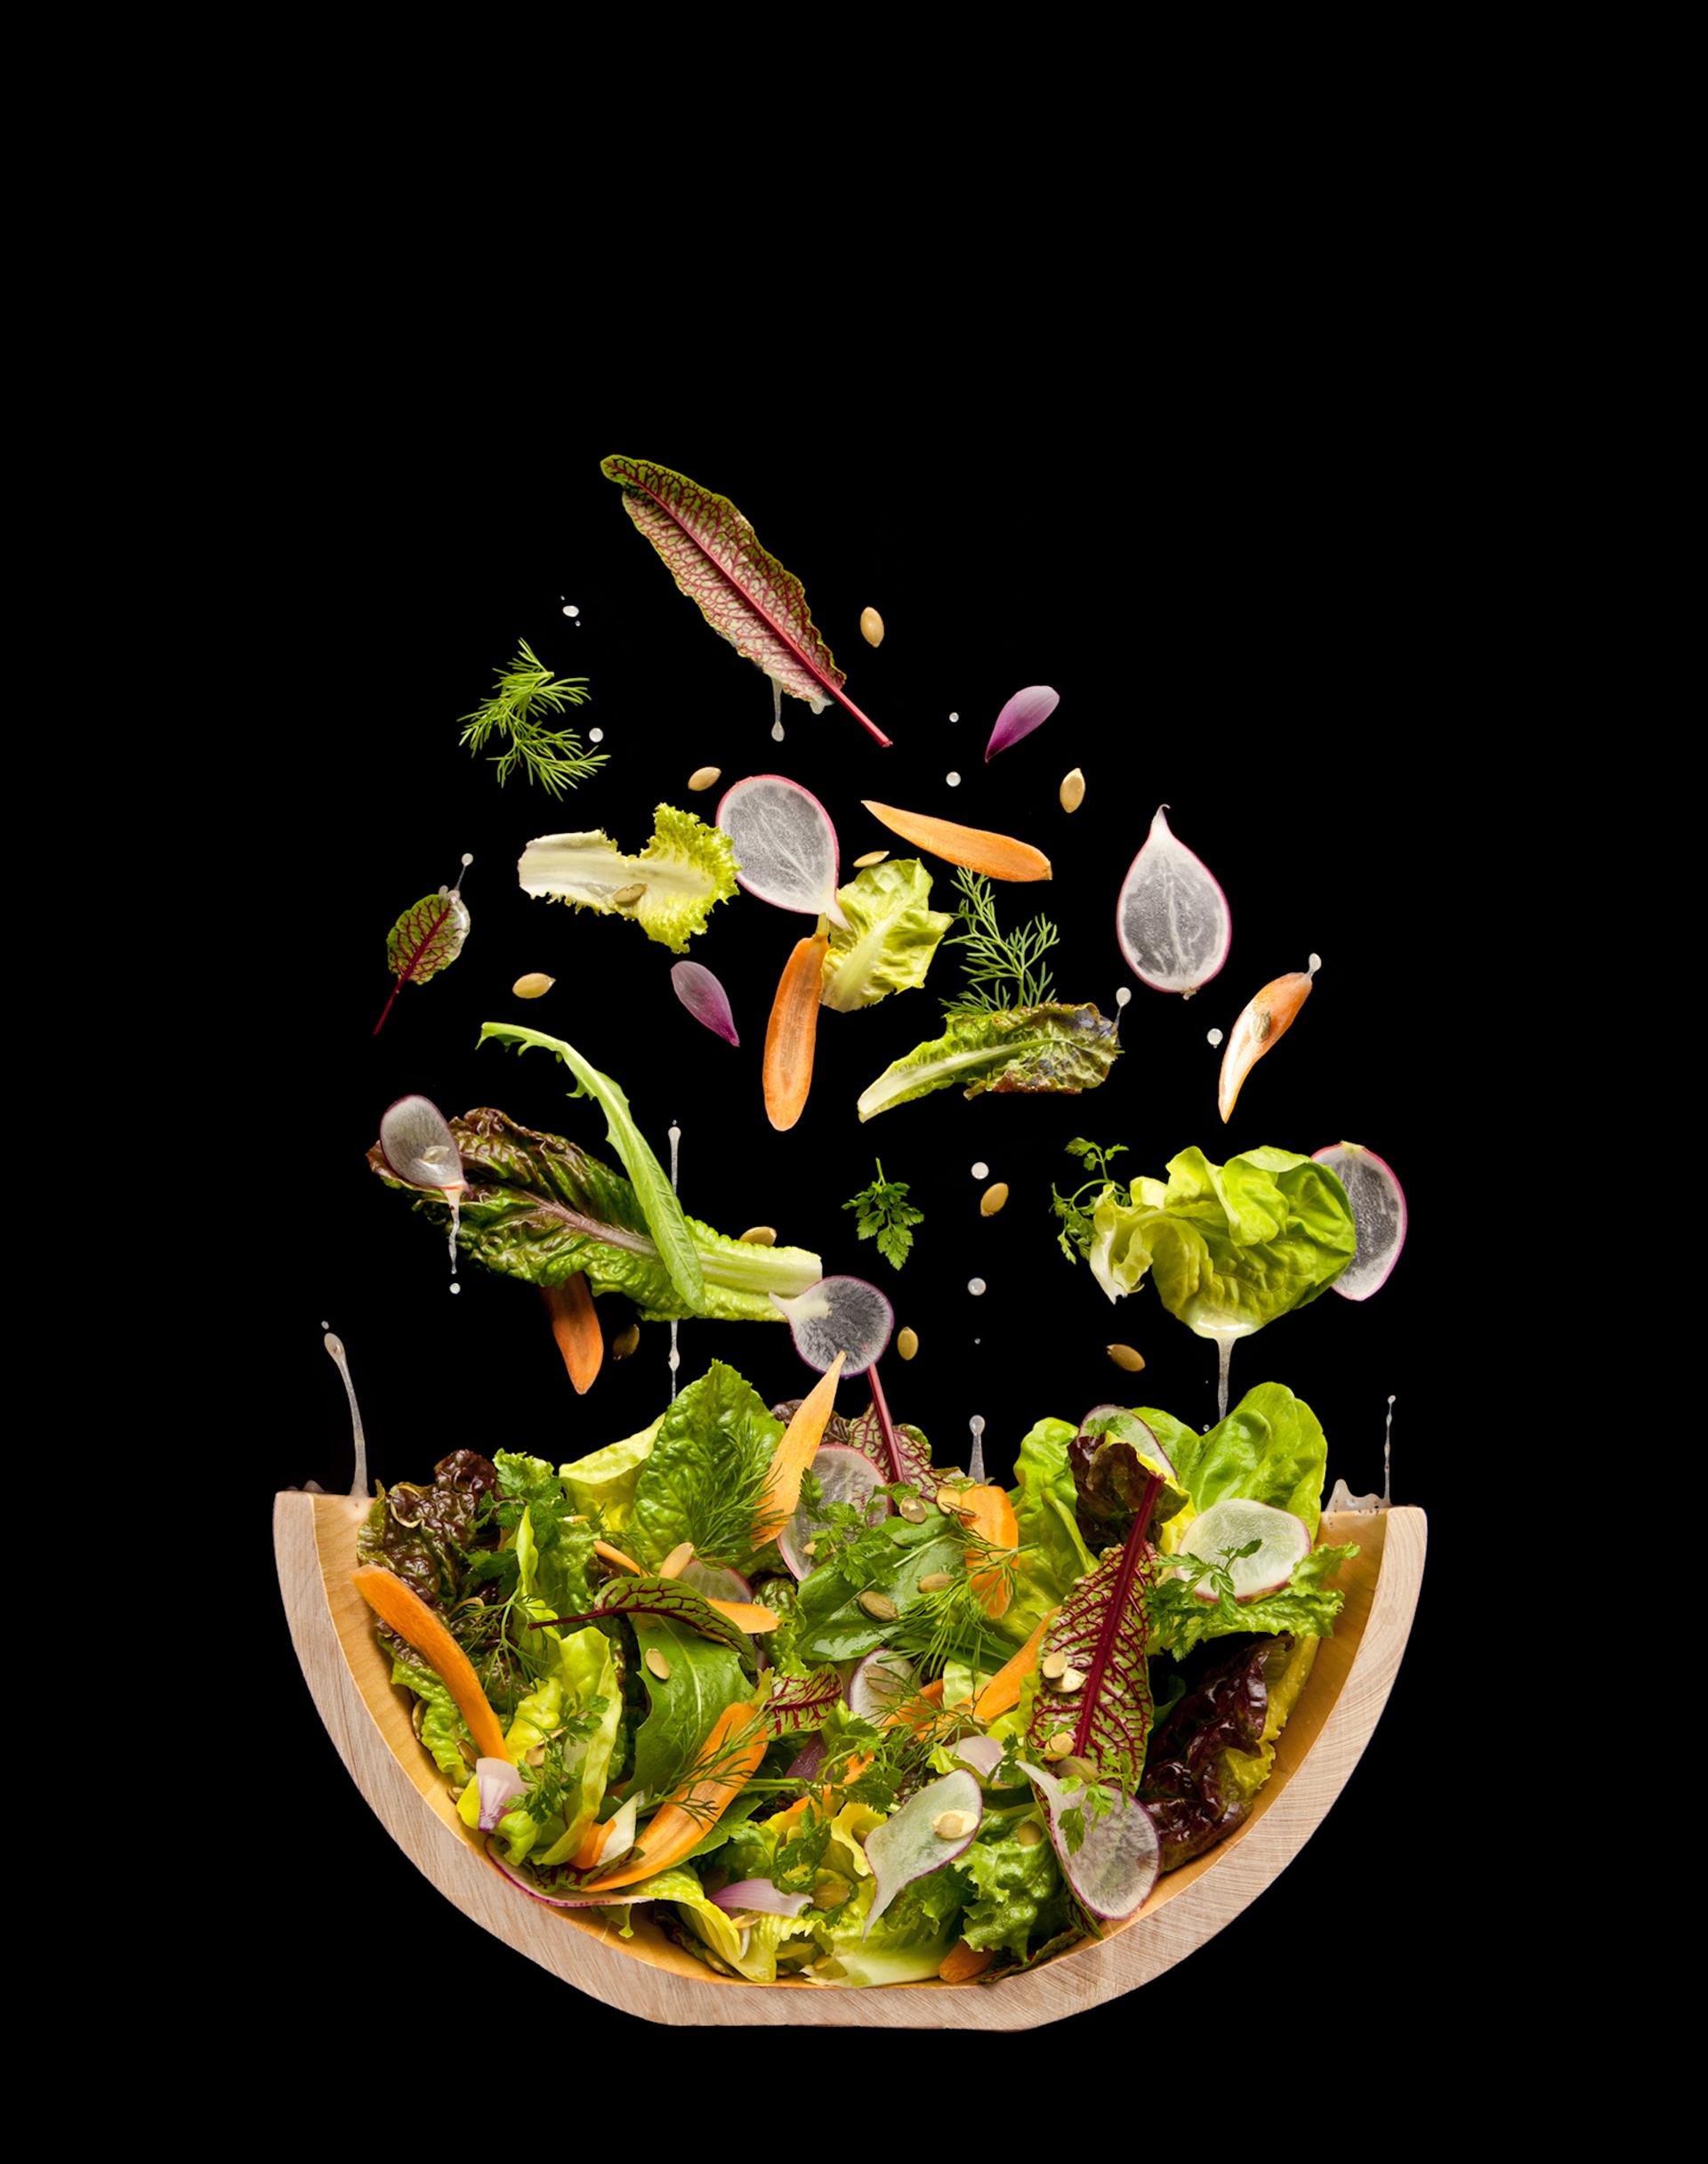 Keine Nebenrolle – Gemüse © Chris Hoover/Modernist Cuisine, LLC